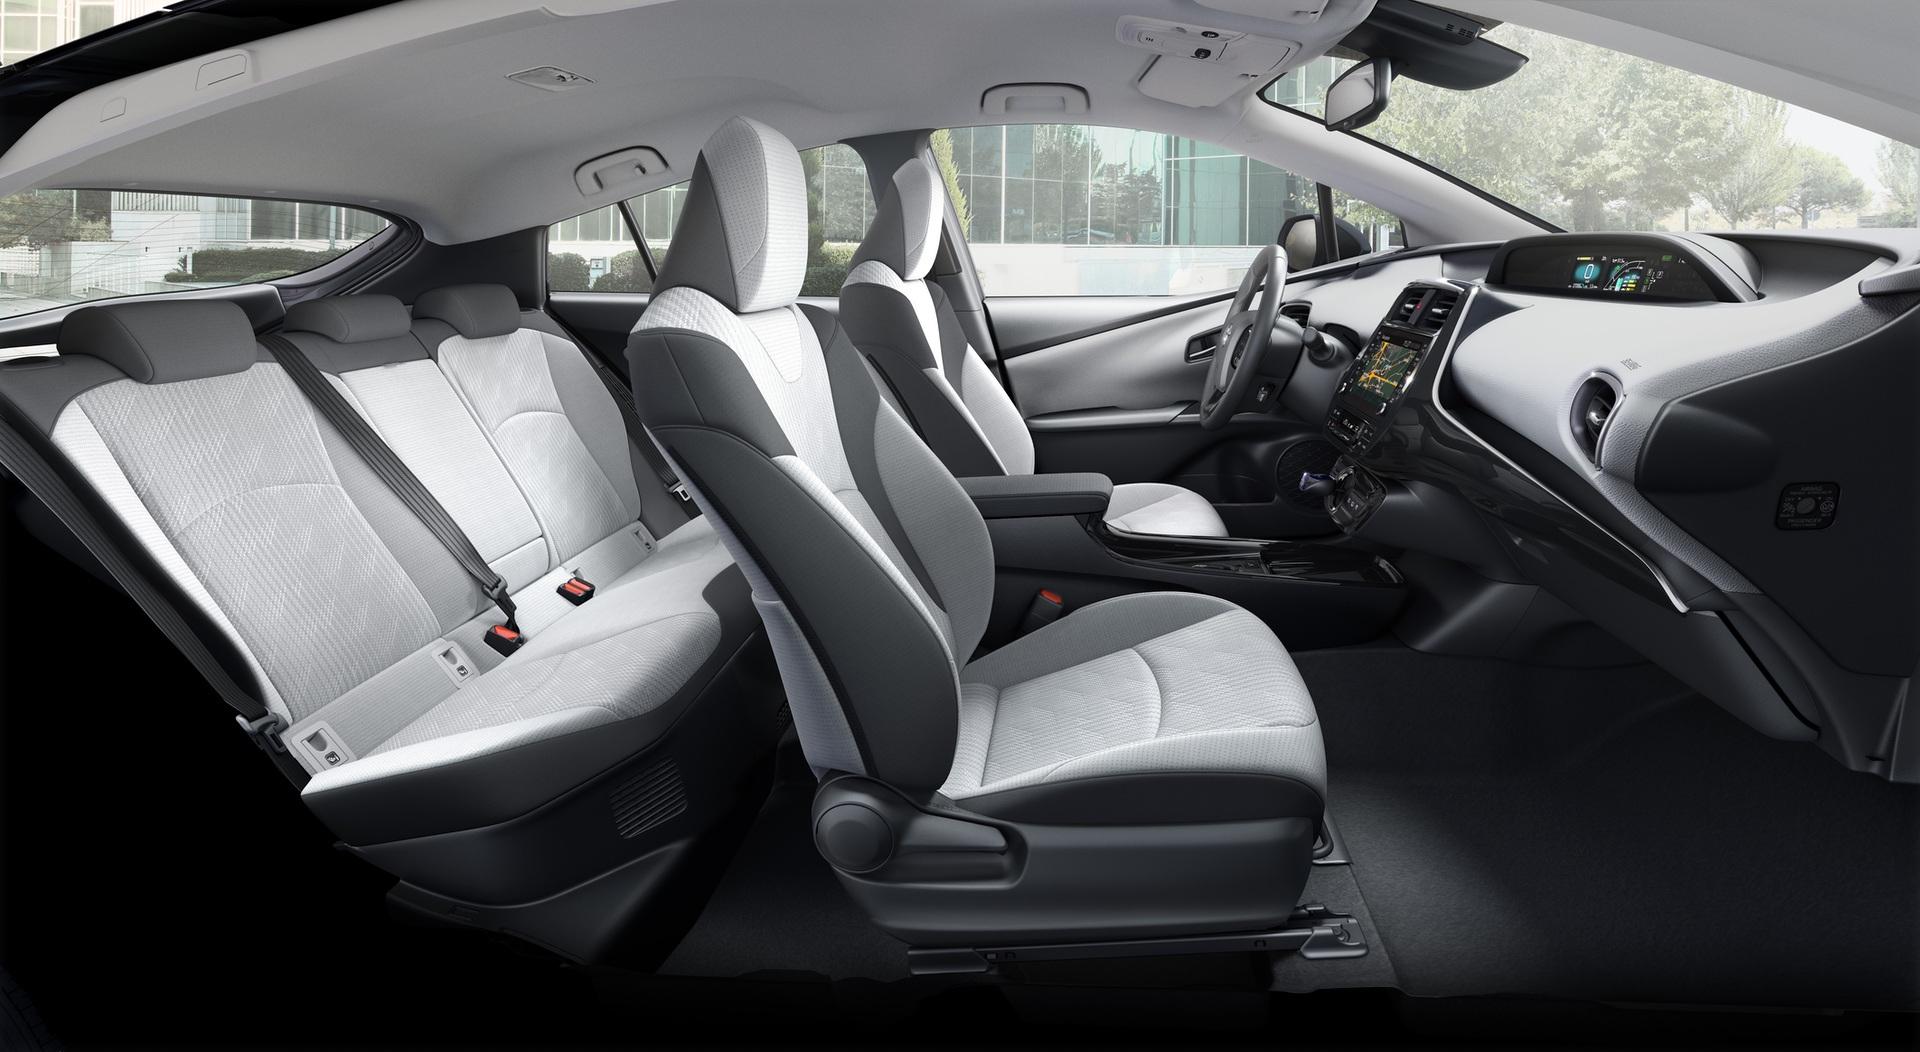 2019_Toyota_Prius_Plug-in_Hybrid_0003